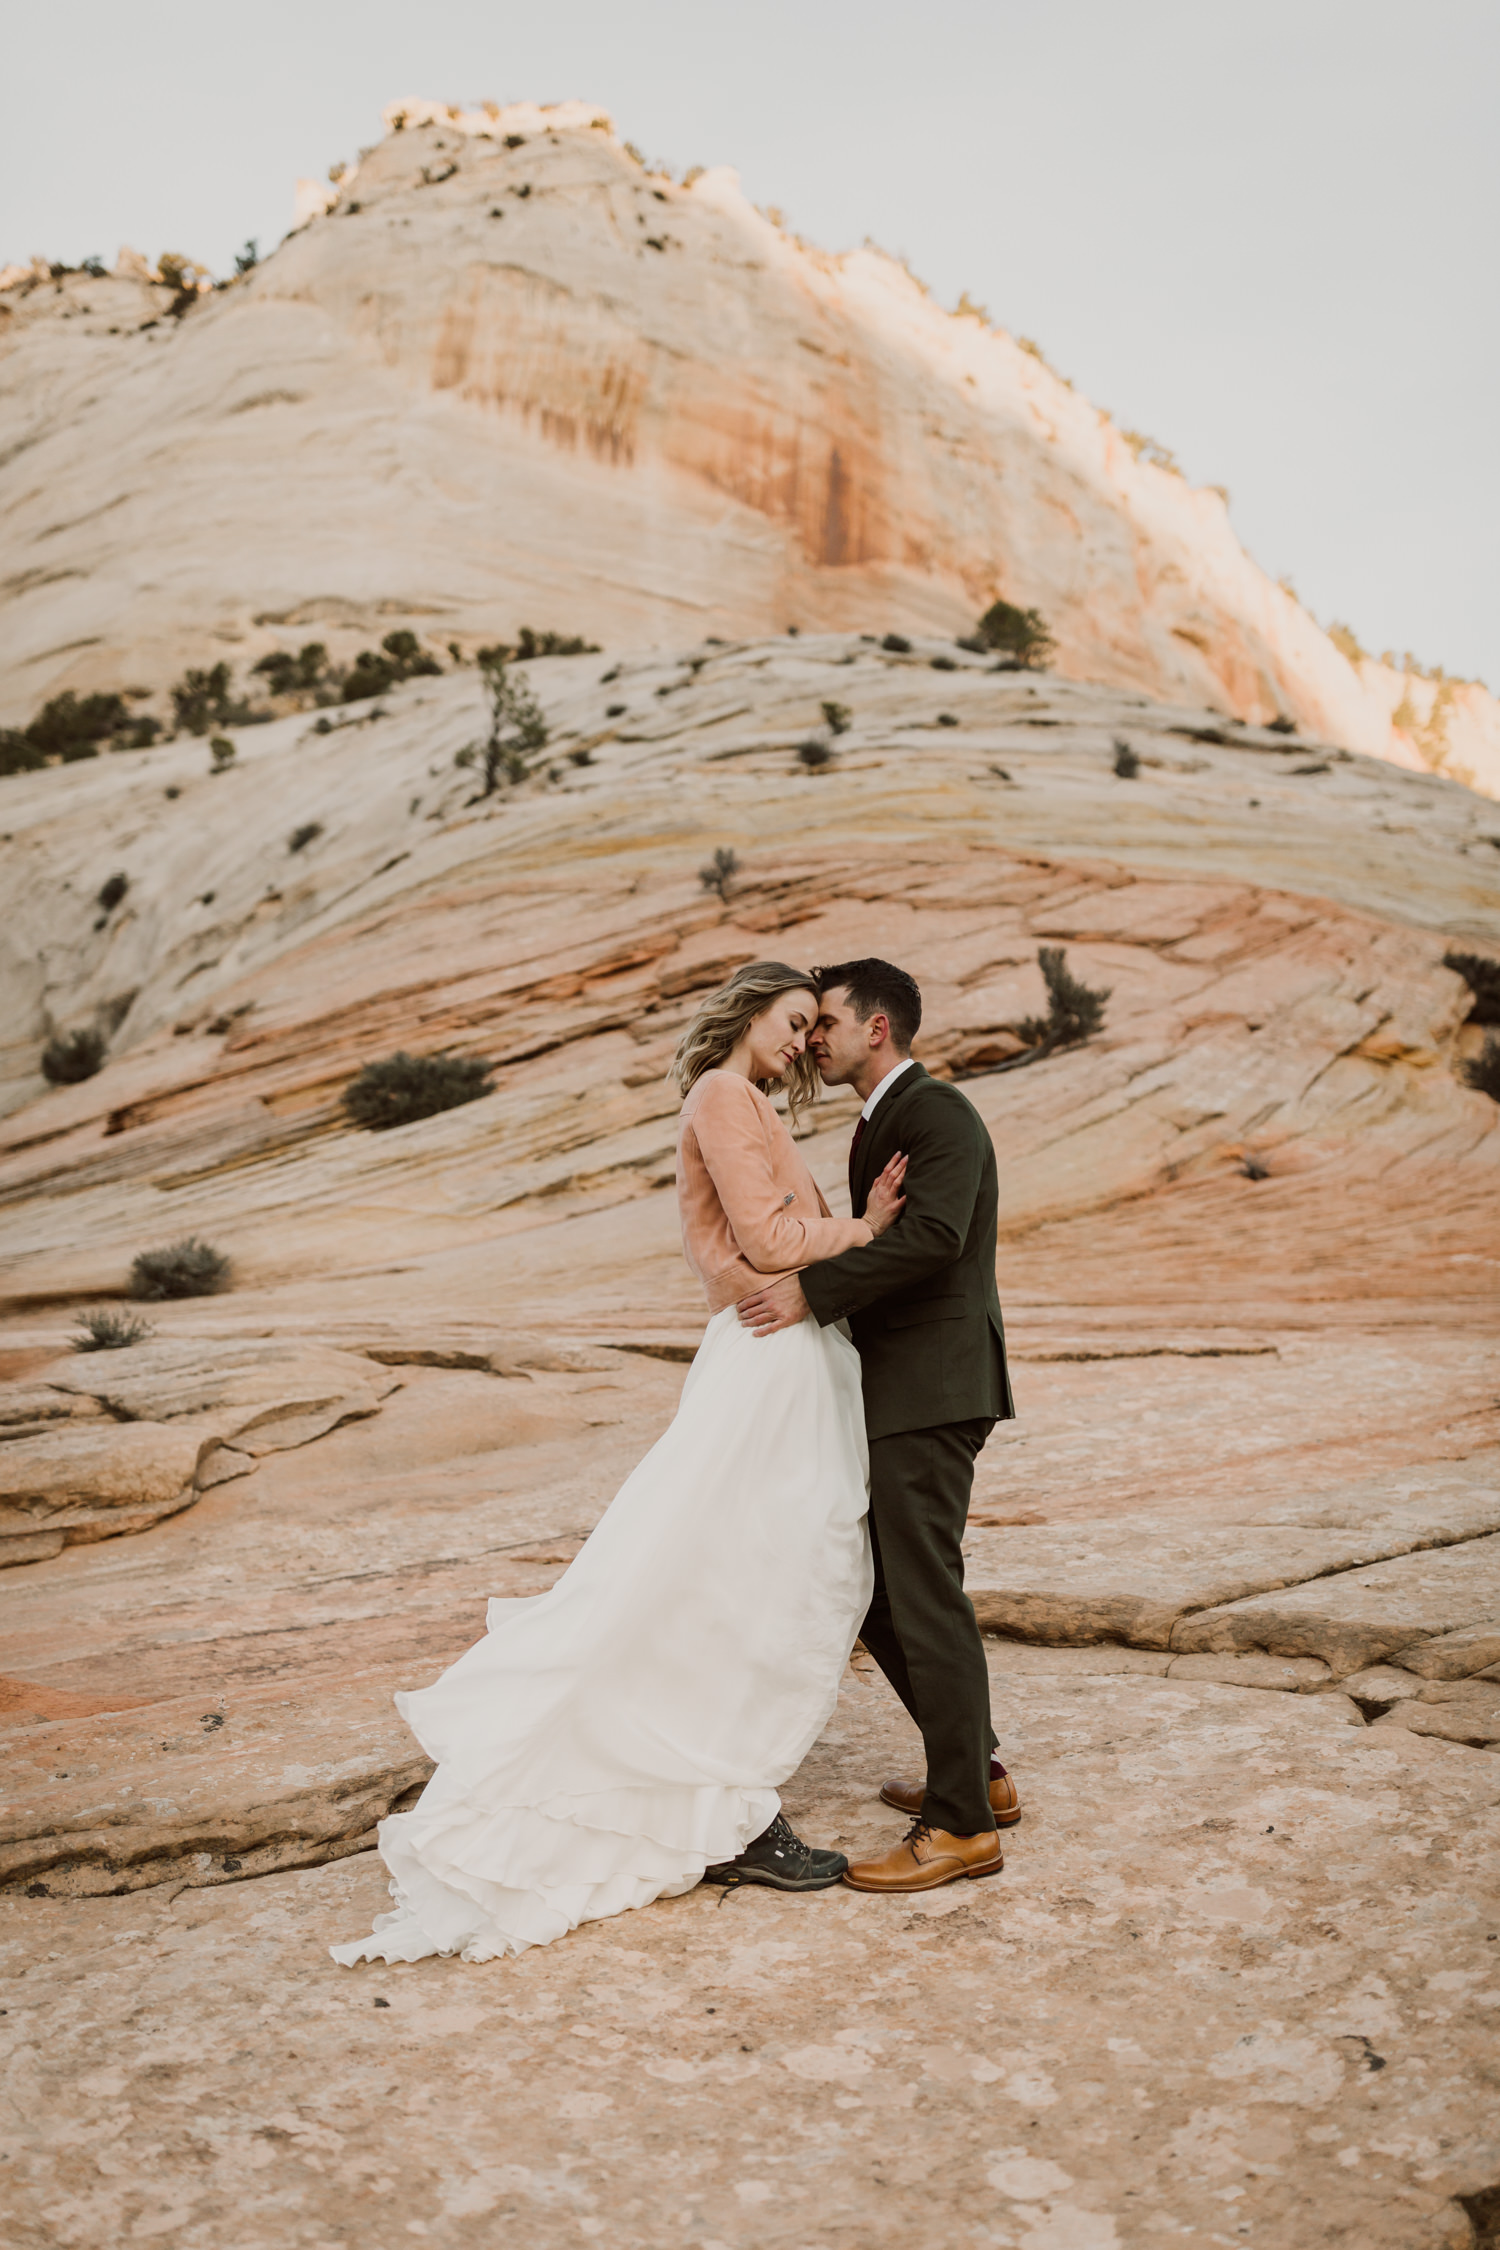 zion-national-park-wedding-44.jpg